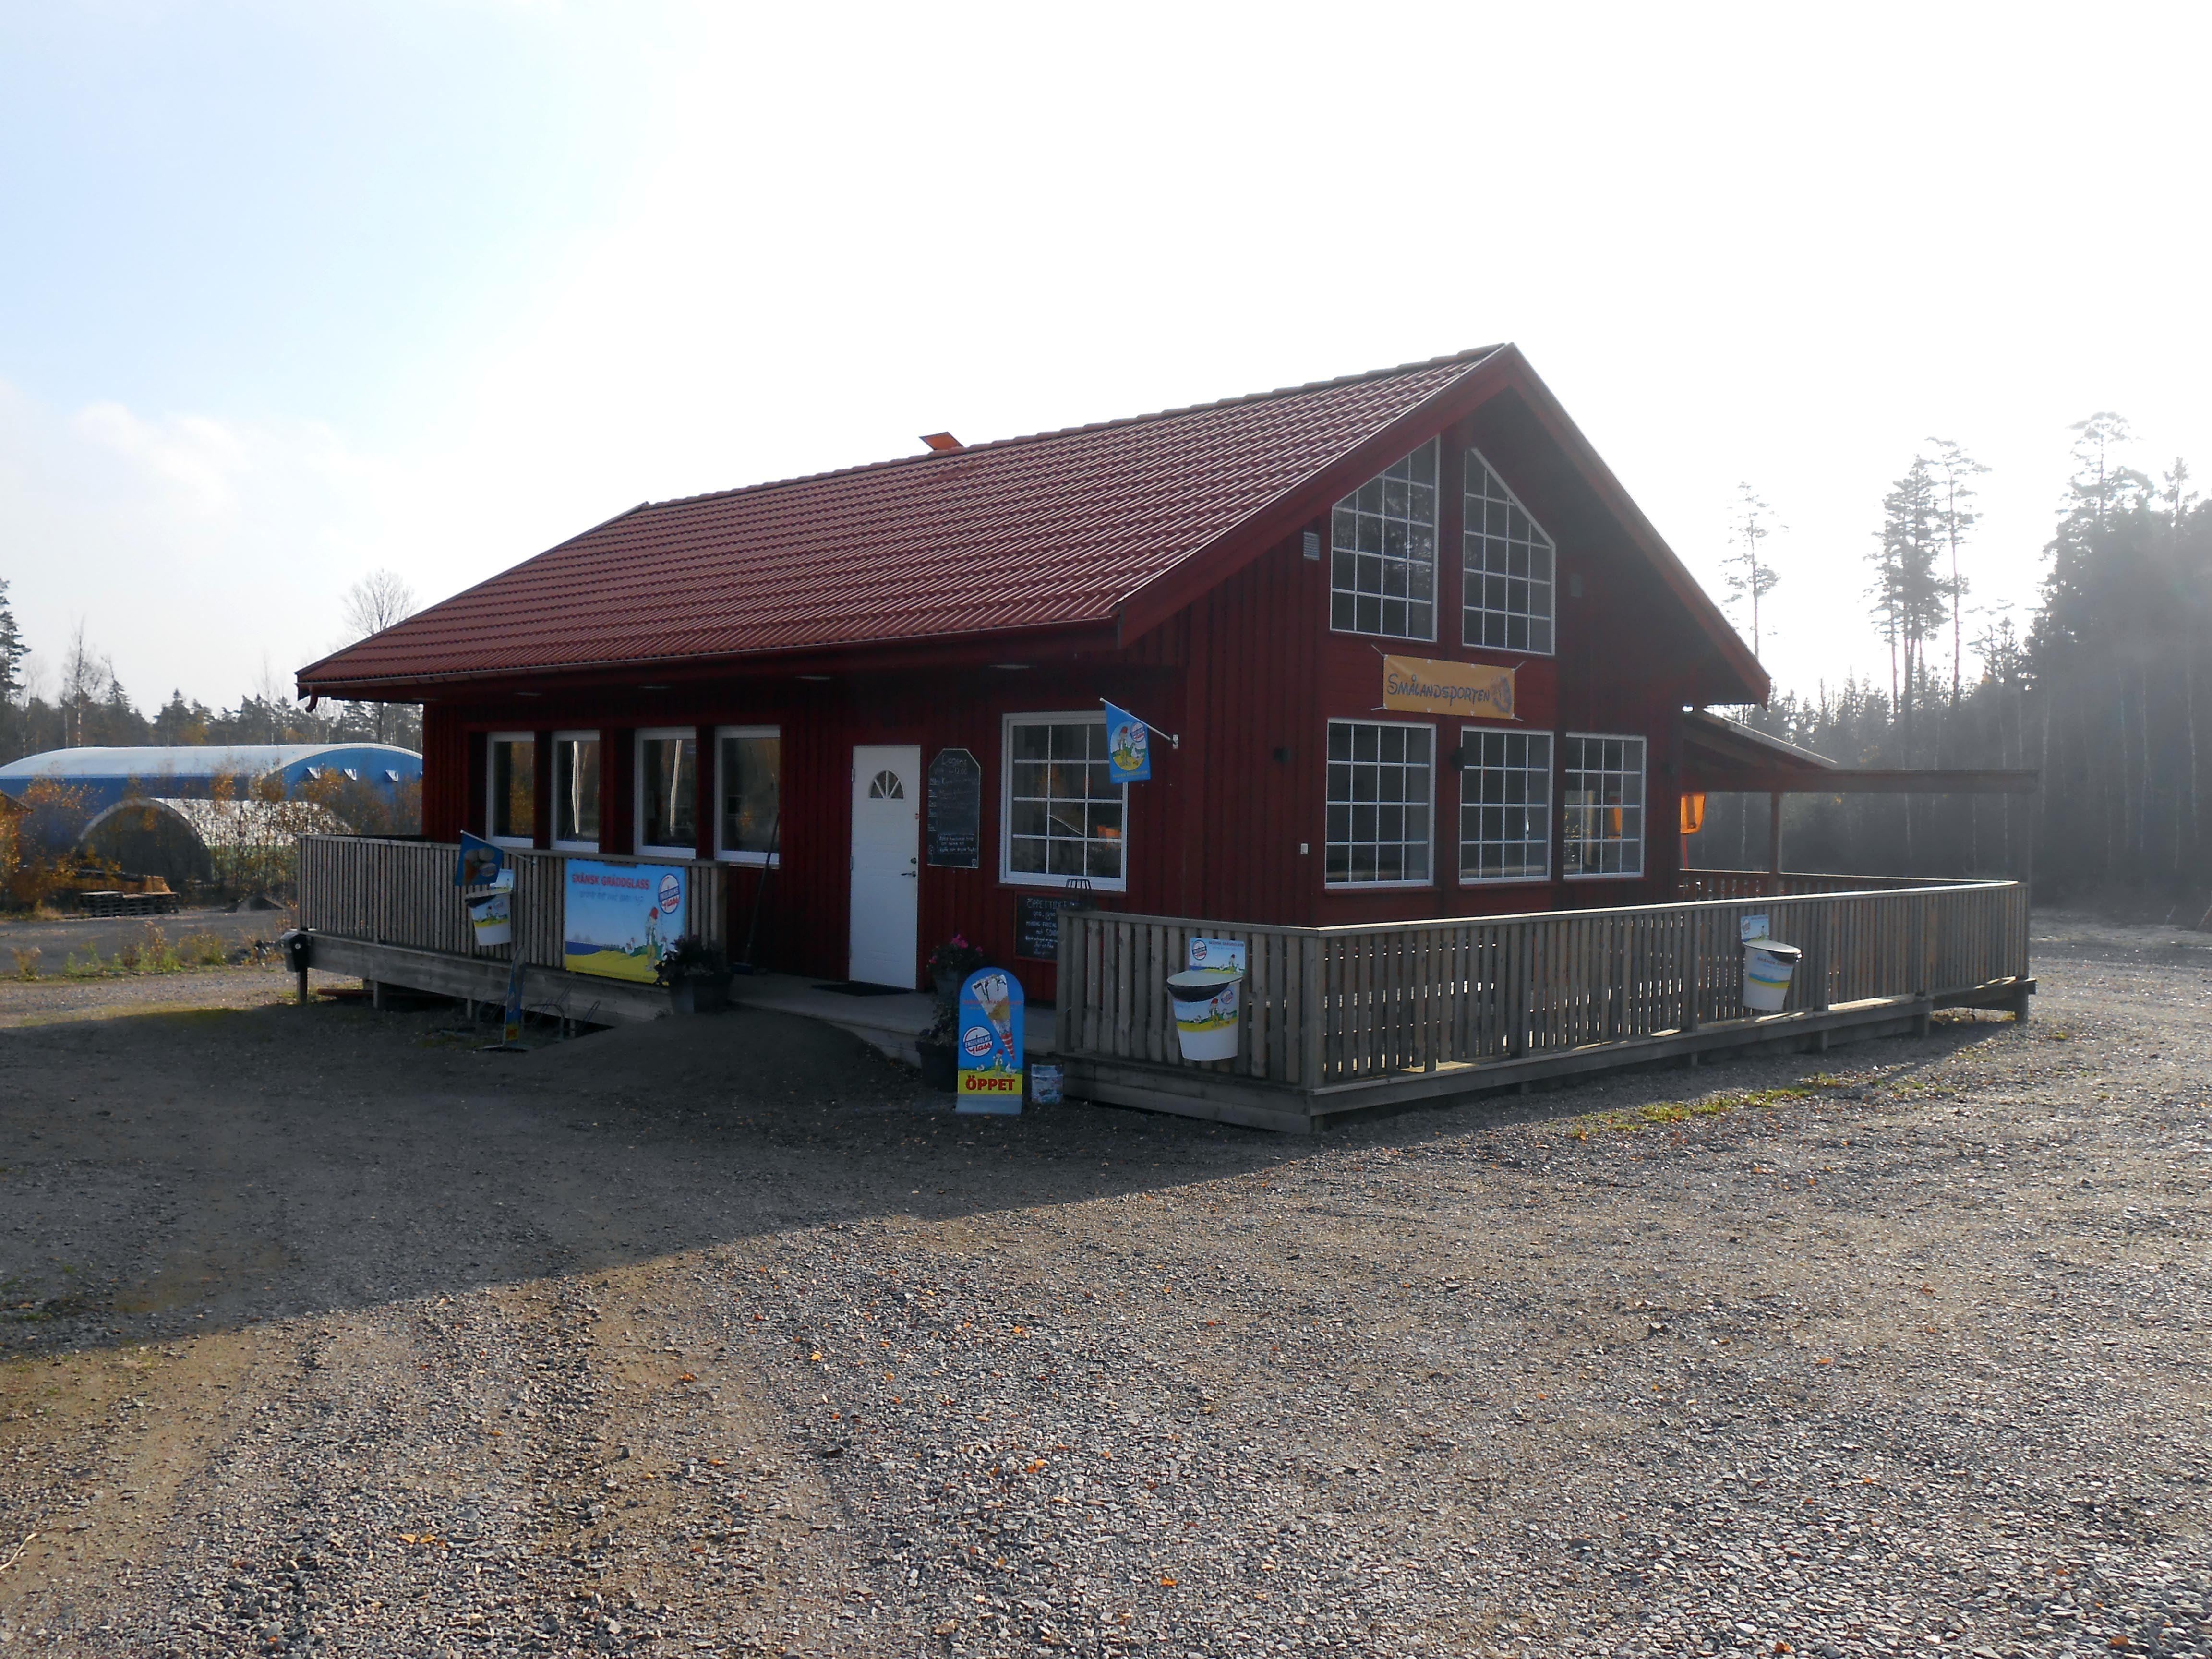 Smålandsporten Roadside Restaurant